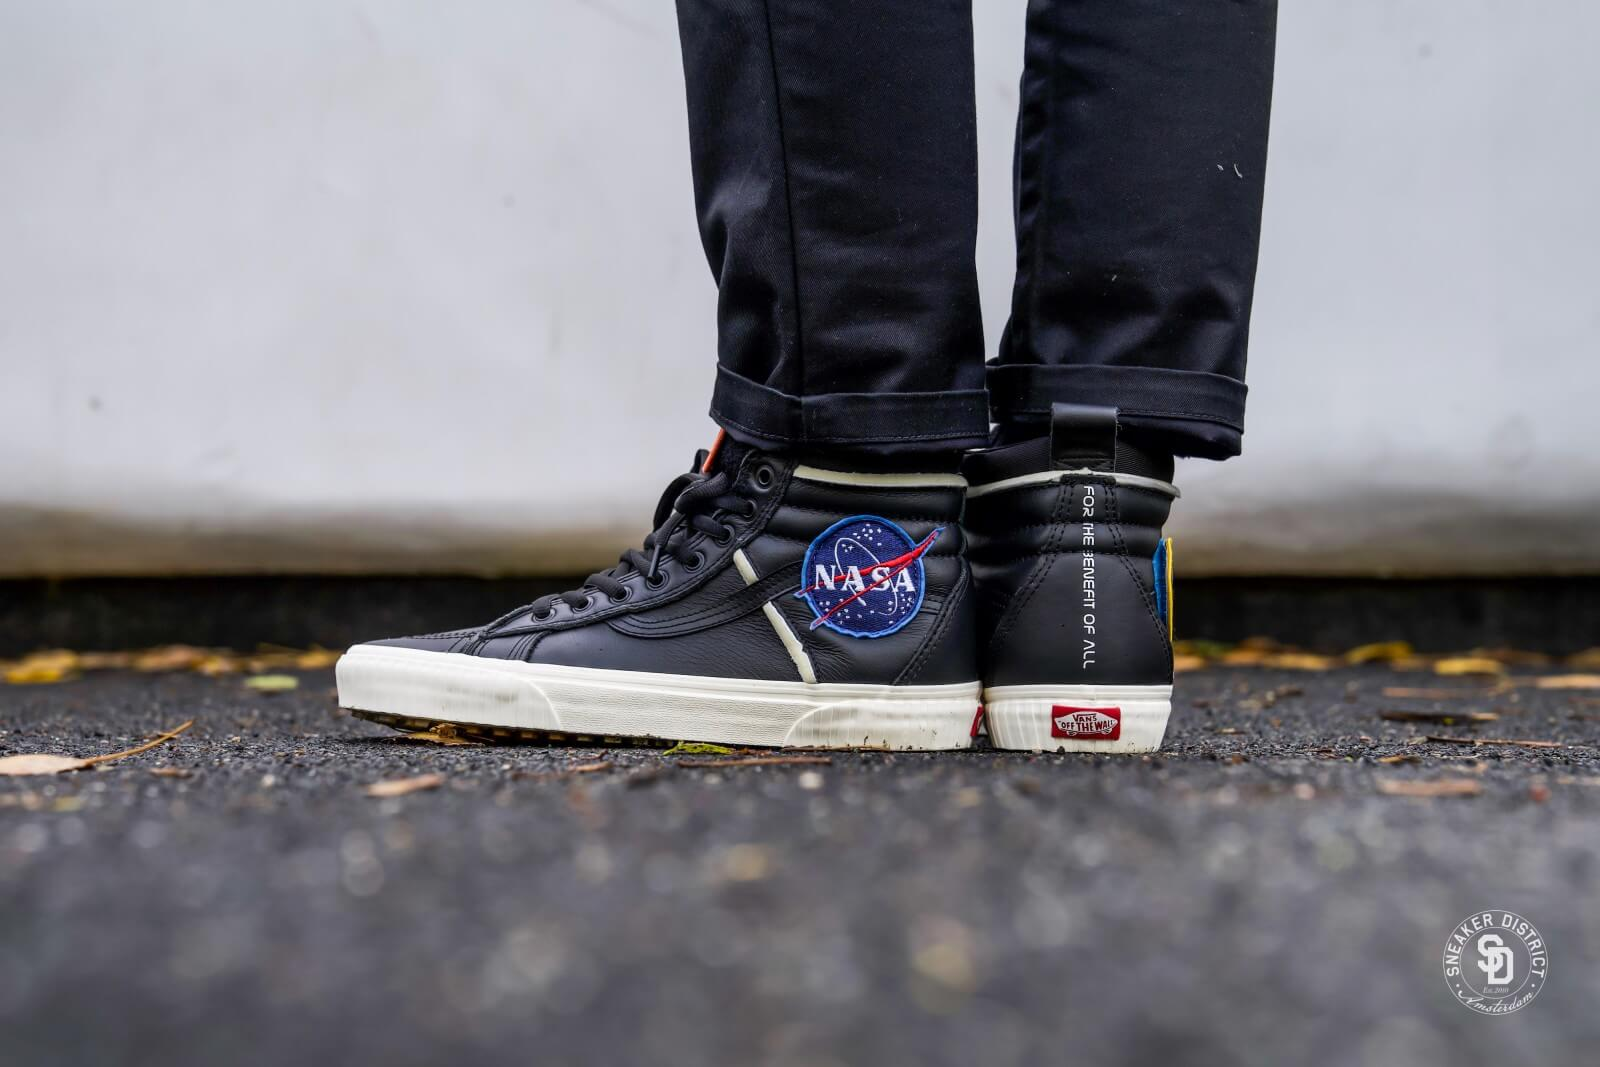 Vans x NASA Sk8 Hi 48 MTE DX Space Voyager Black VN0A3DQ5UQ31